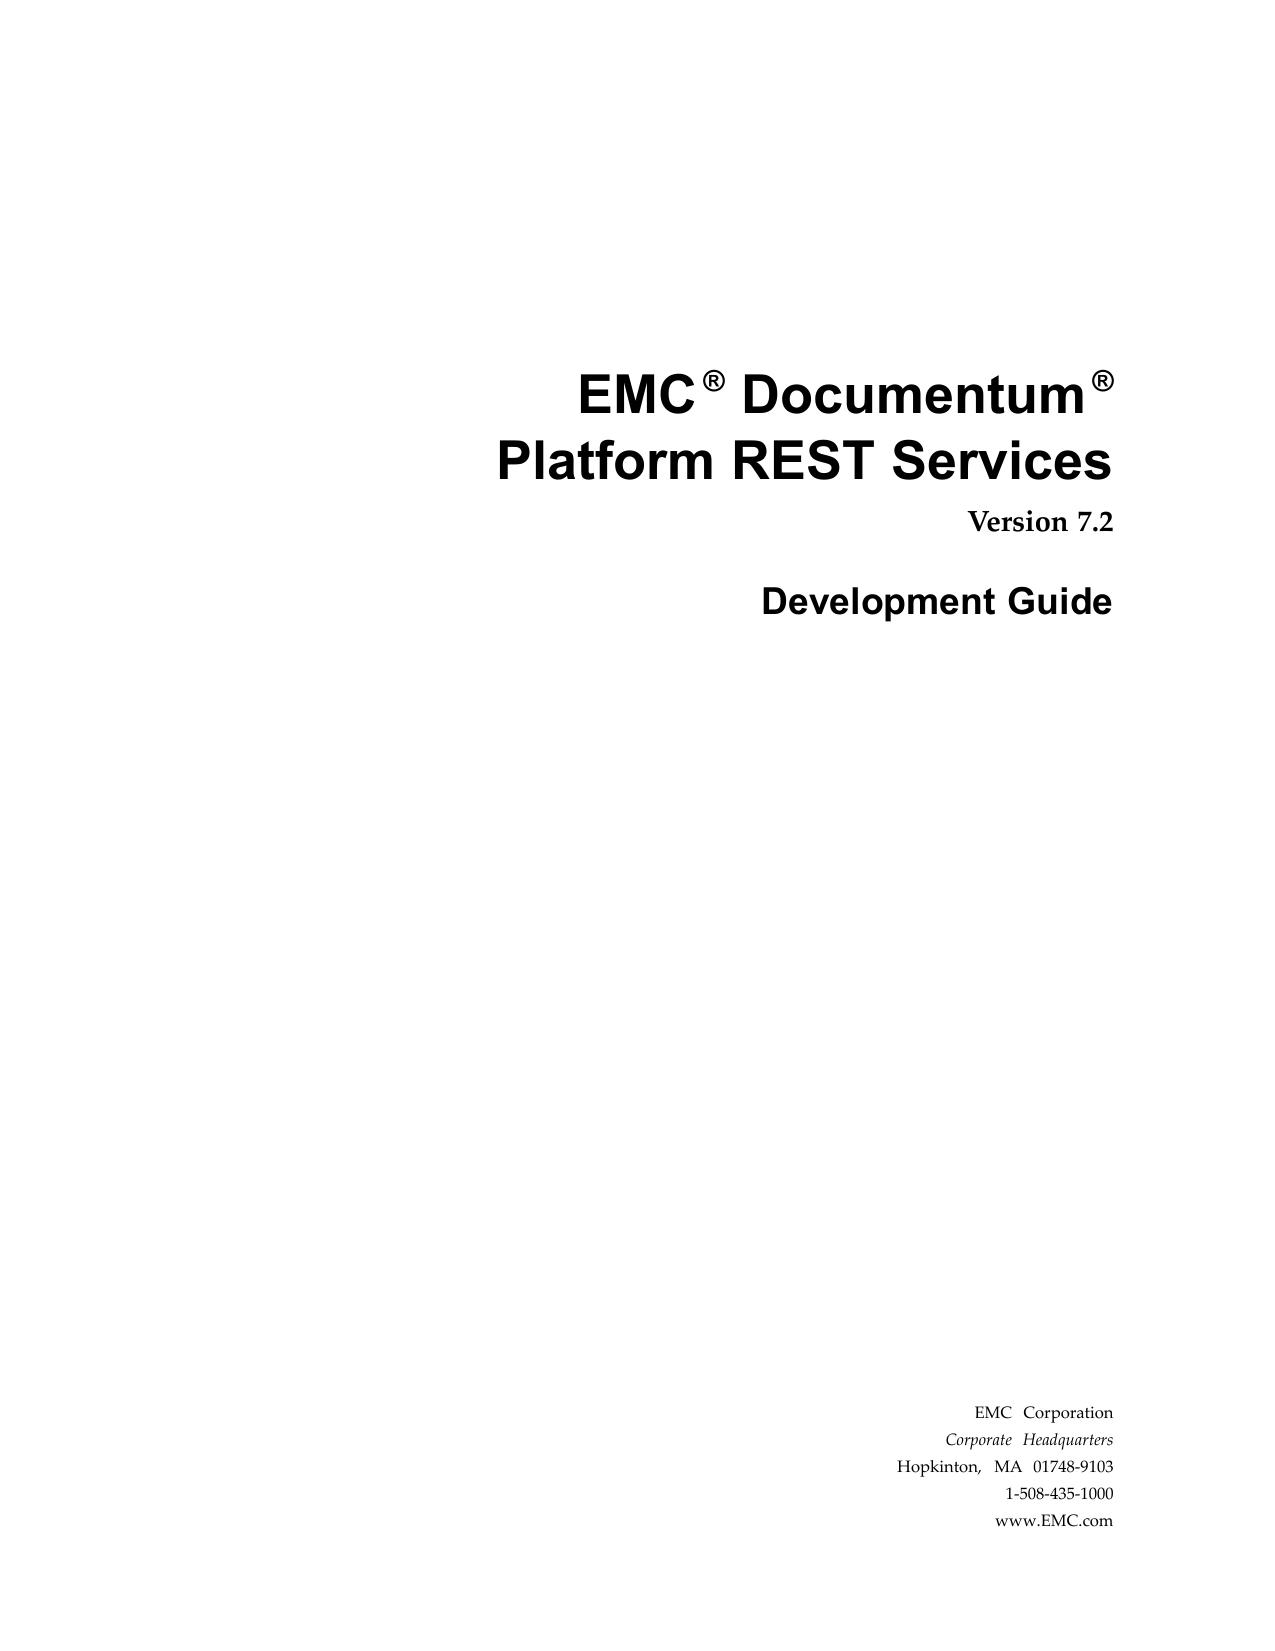 Documentum Platform REST Services 7.2 Development Guide ...